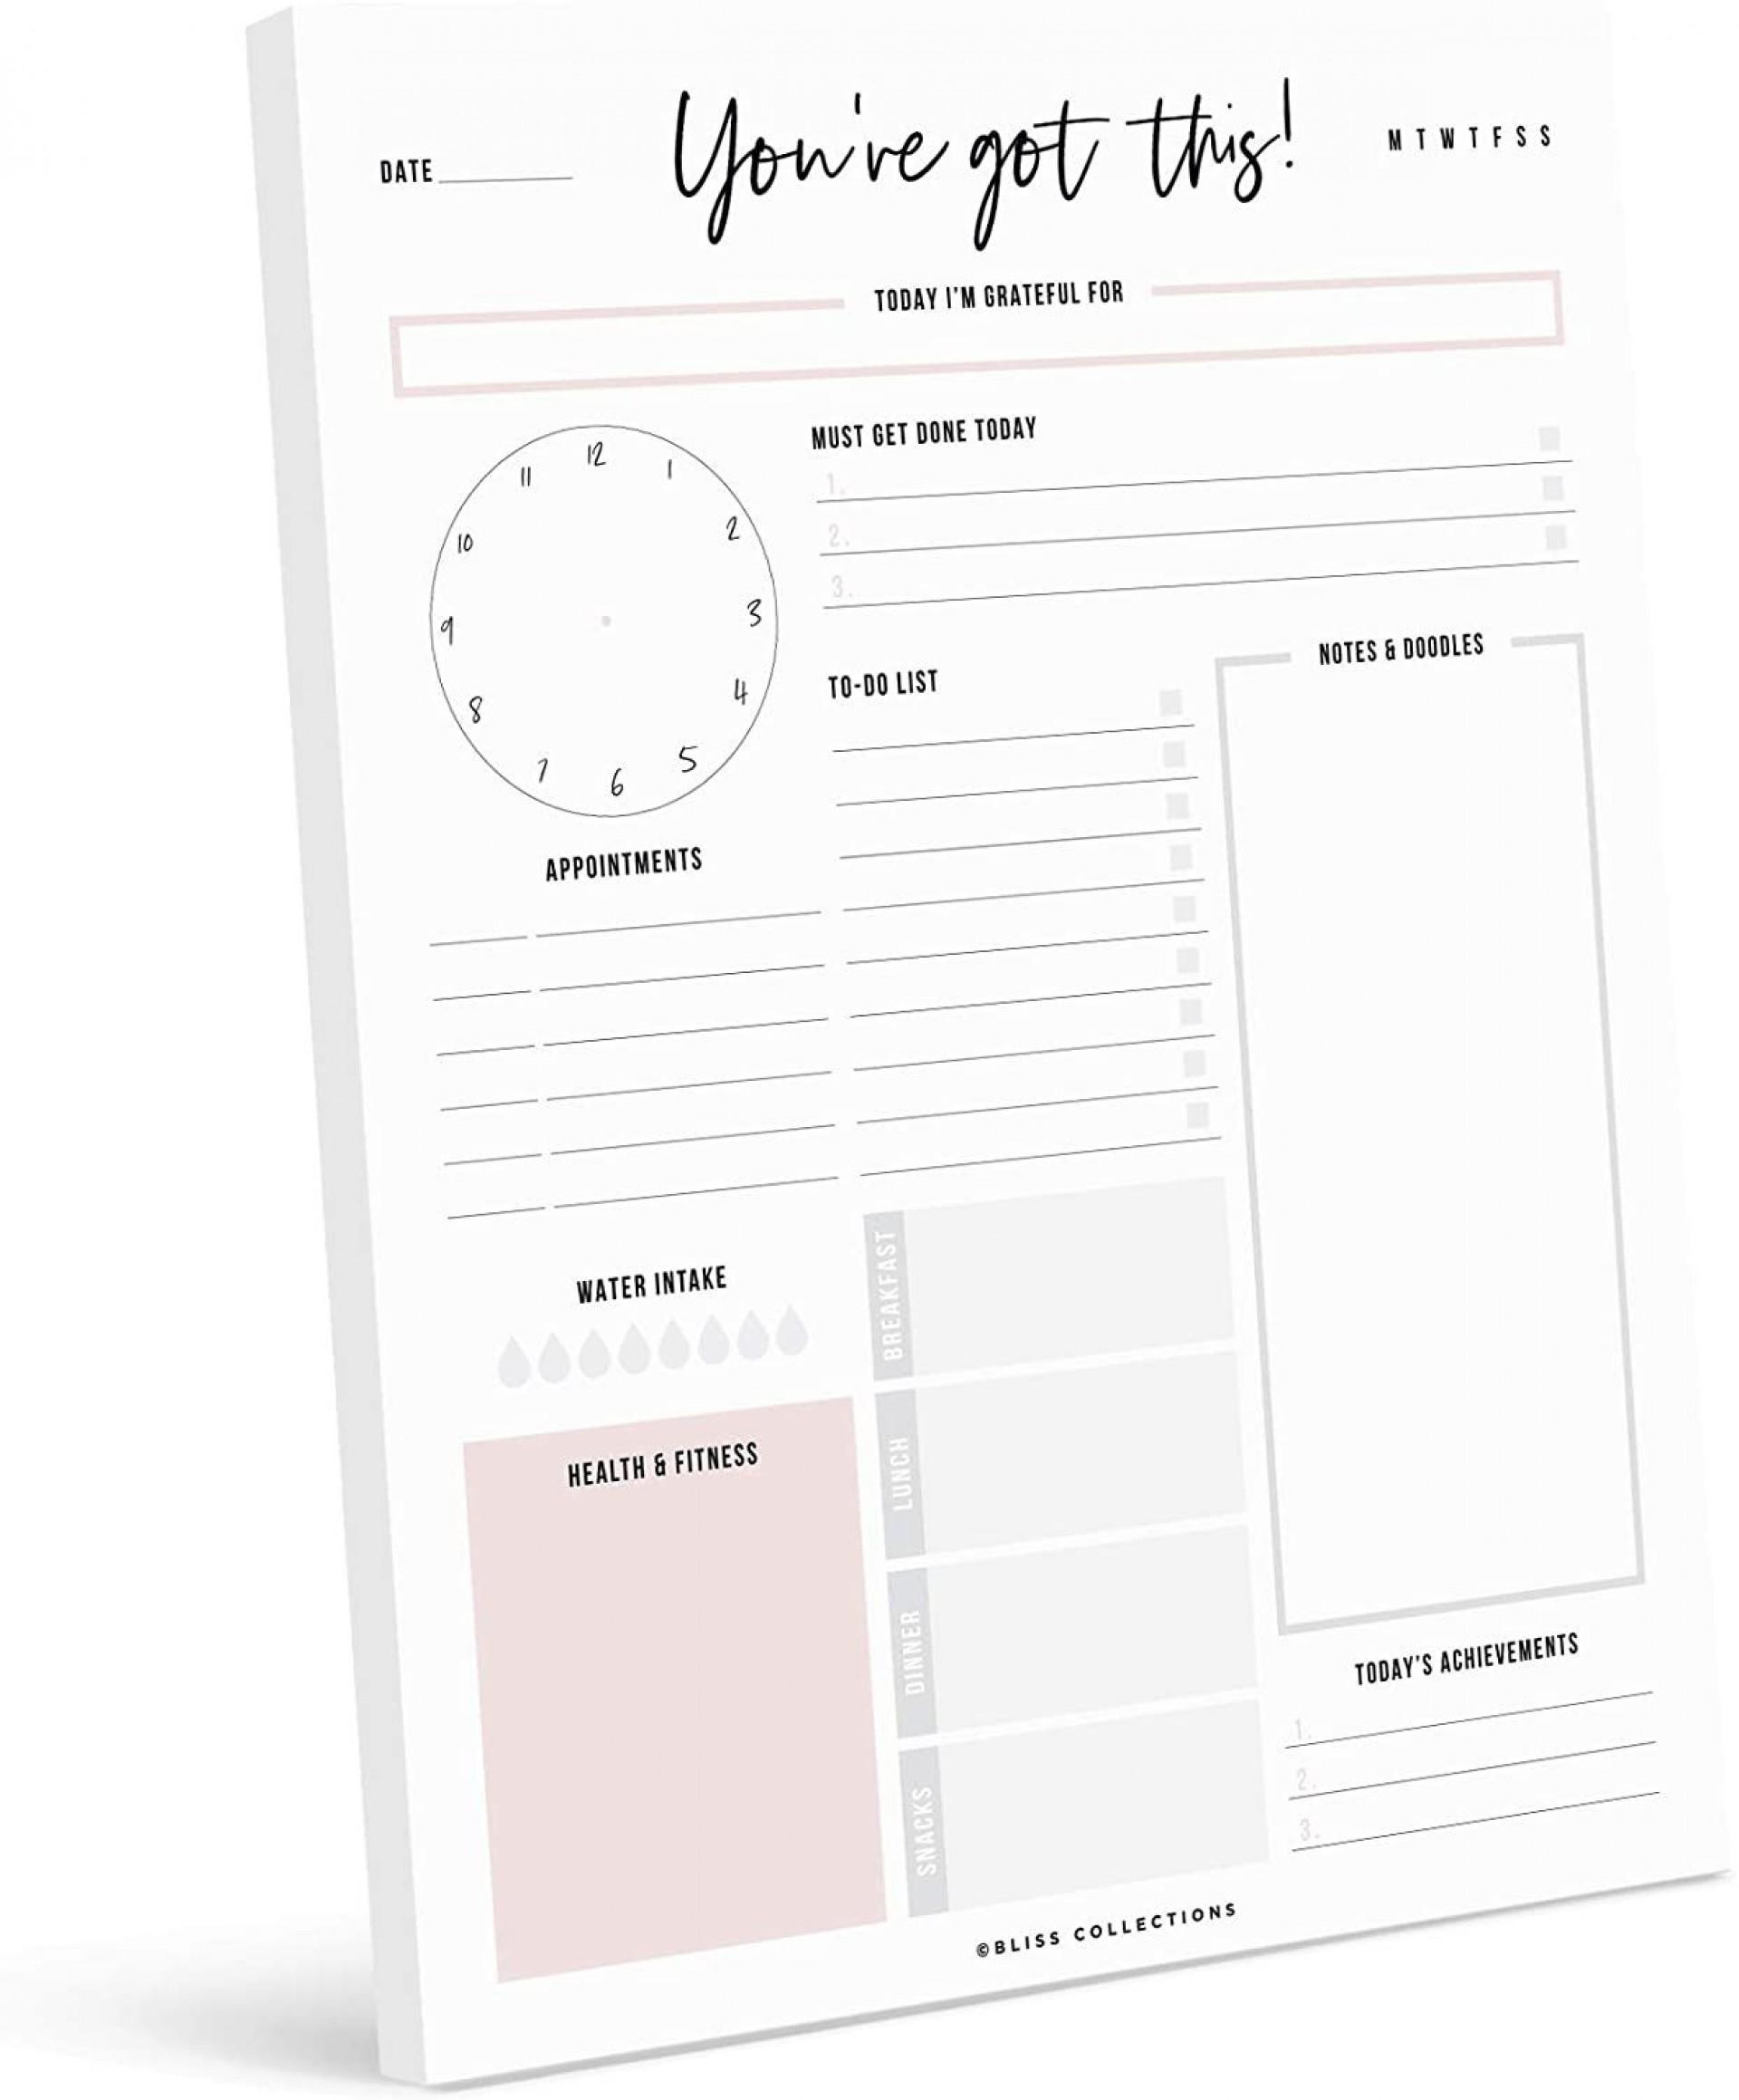 001 Stupendou Real Estate Daily Planner Template Design 1920